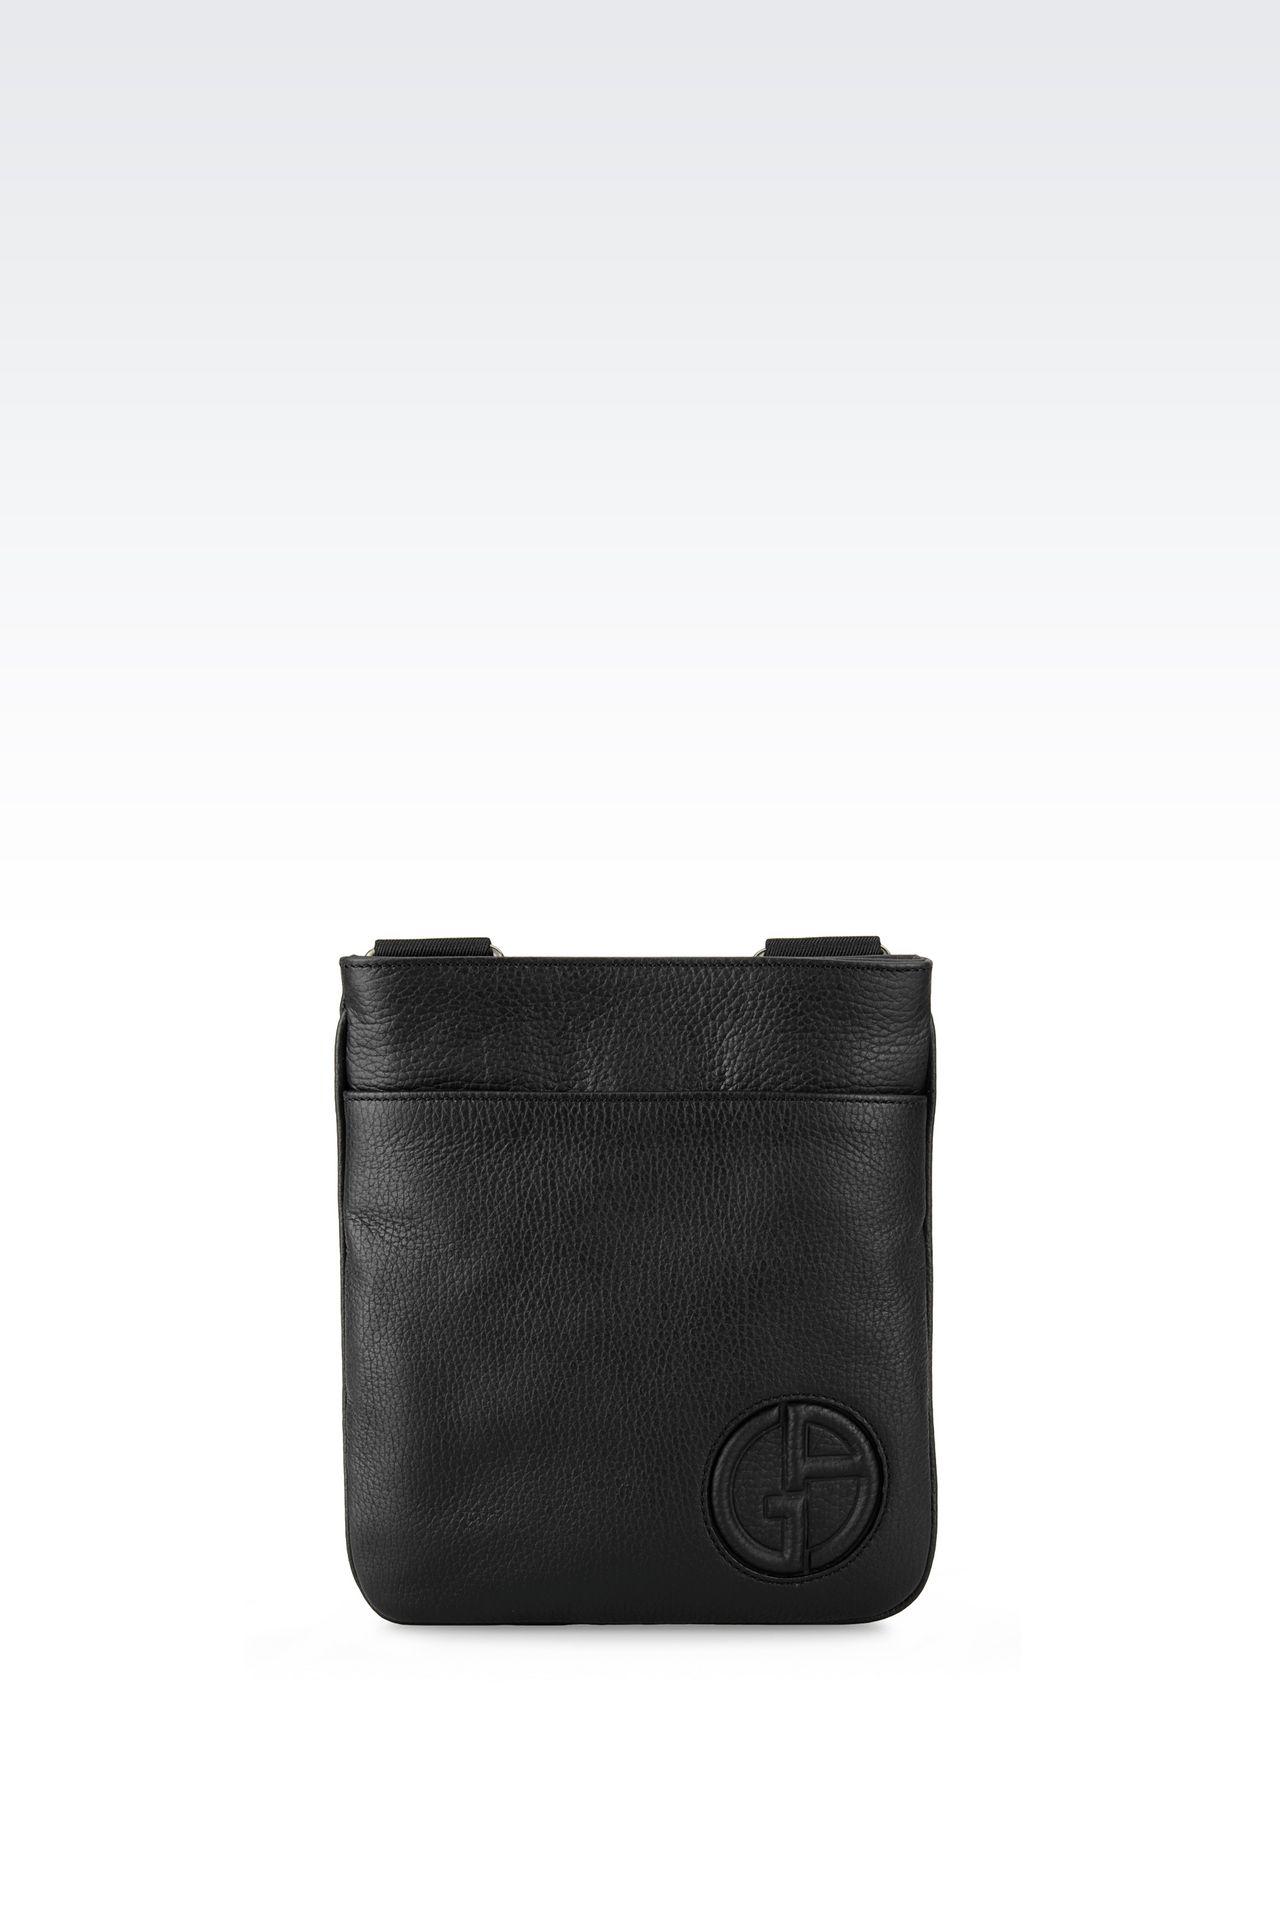 FLAT MESSENGER BAG IN TUMBLED CALFSKIN: Messenger bags Men by Armani - 0